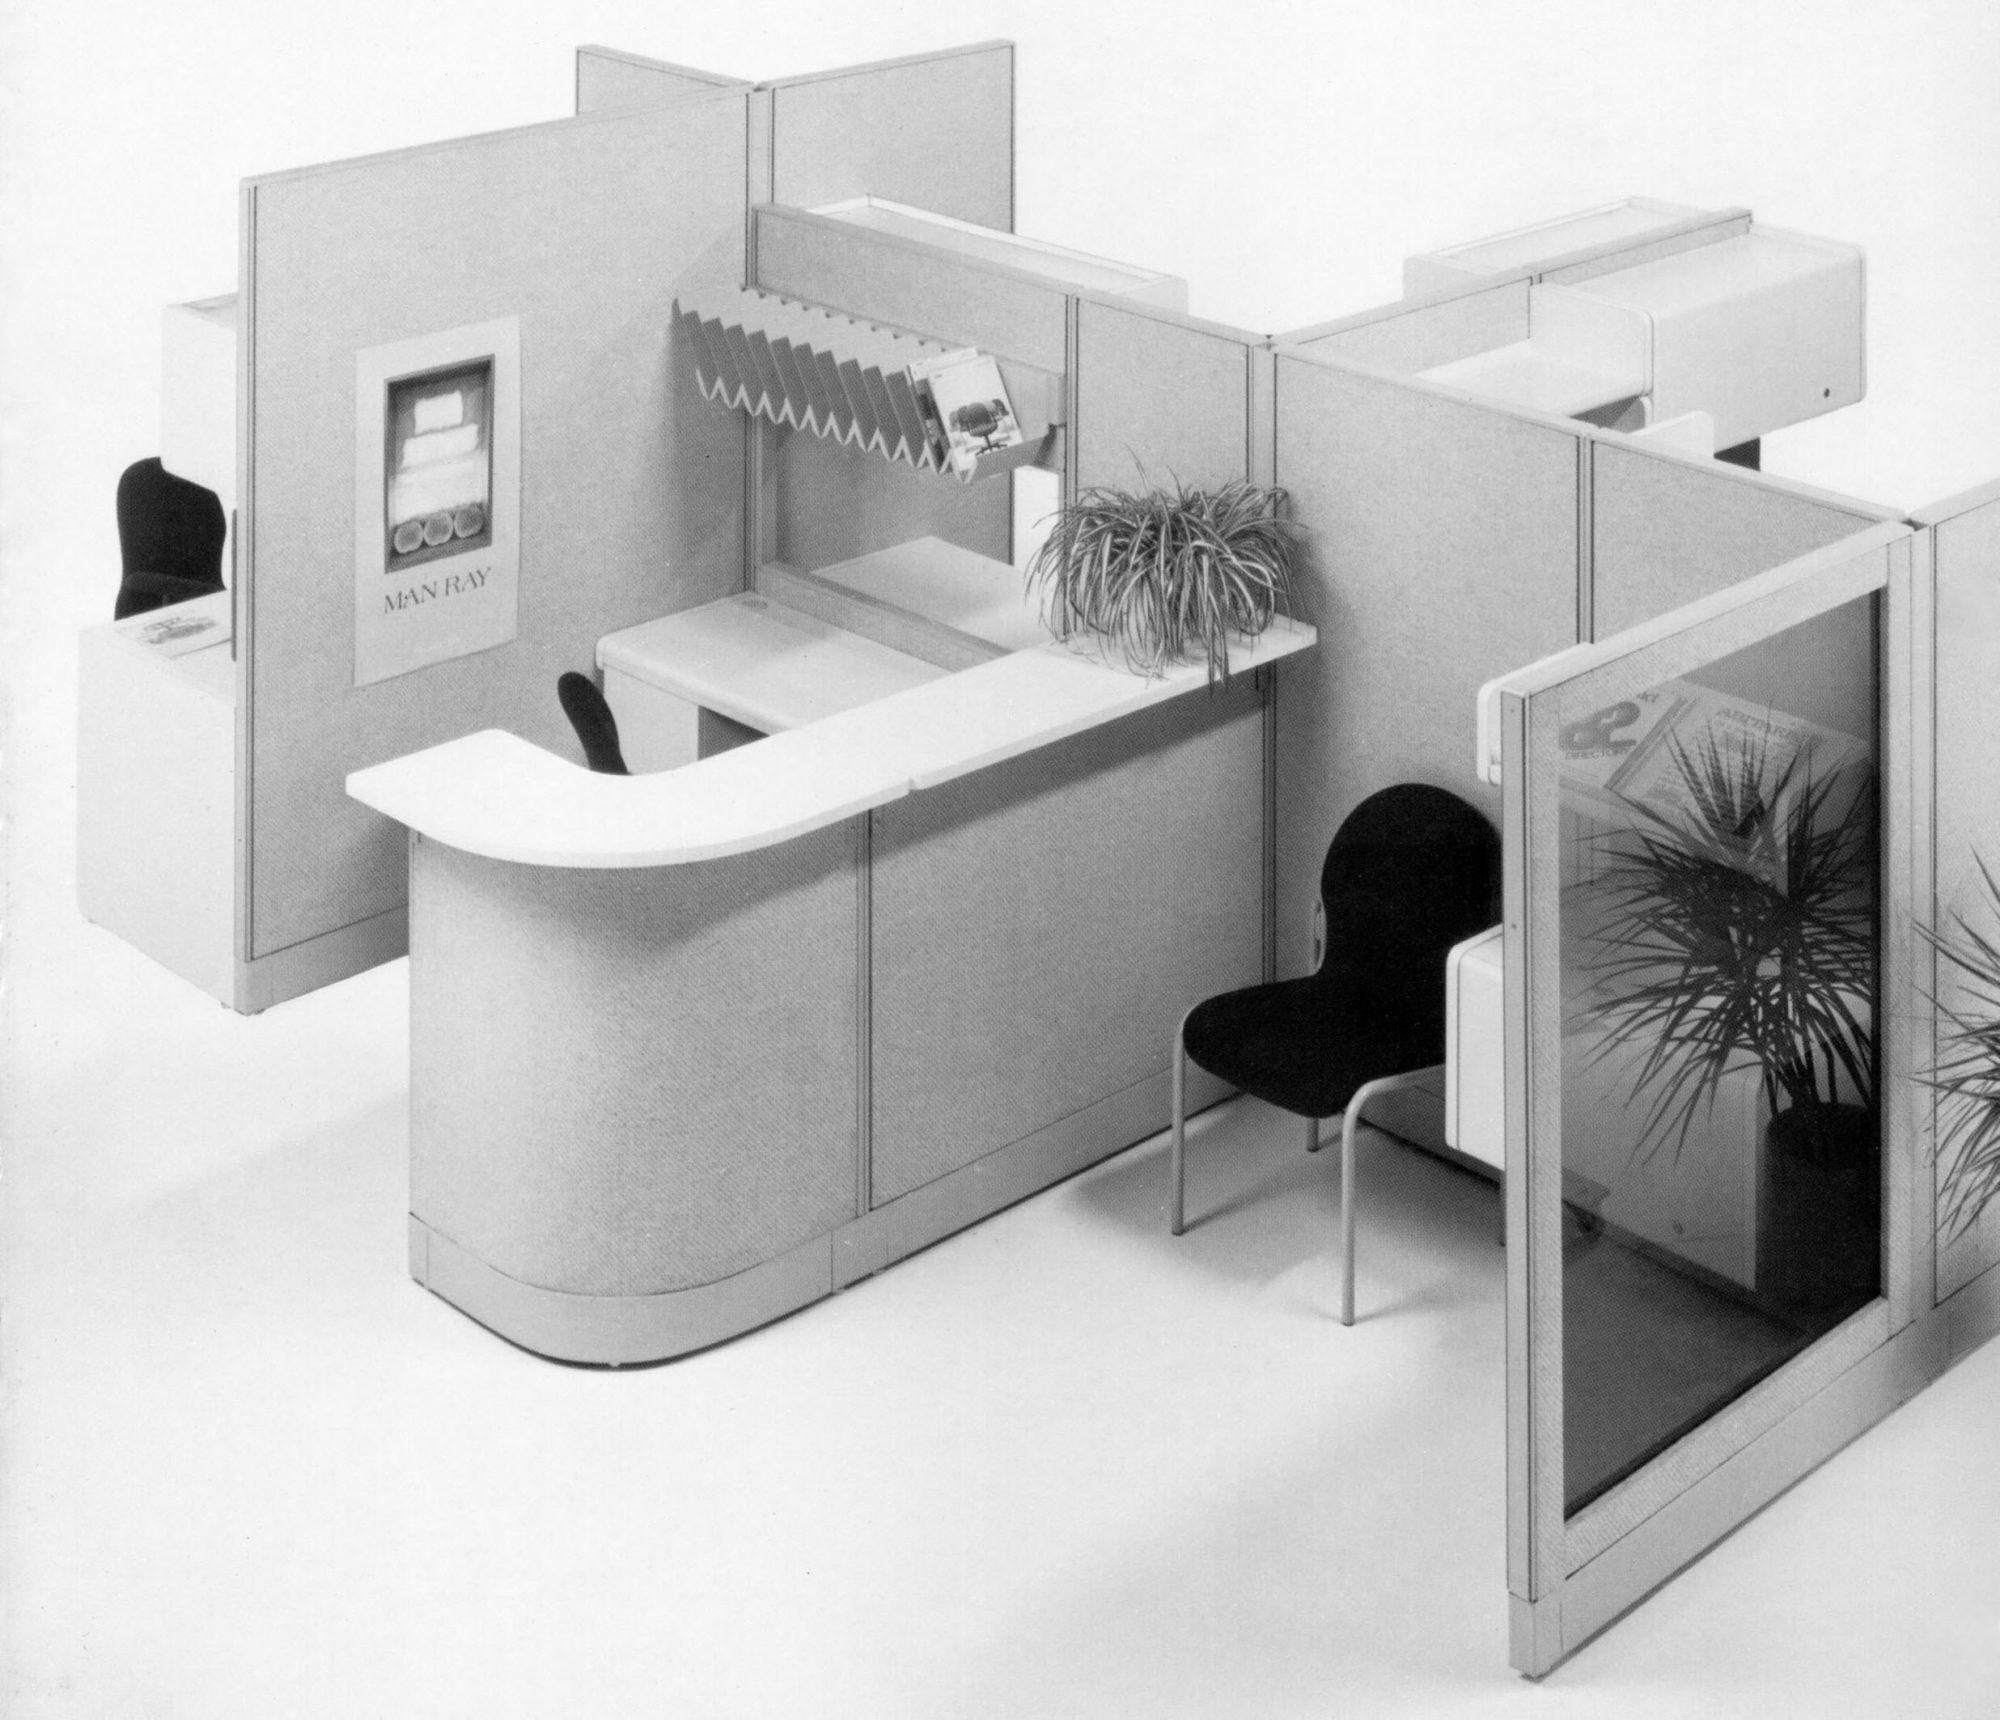 mobilier de bureau luc bergeron design. Black Bedroom Furniture Sets. Home Design Ideas